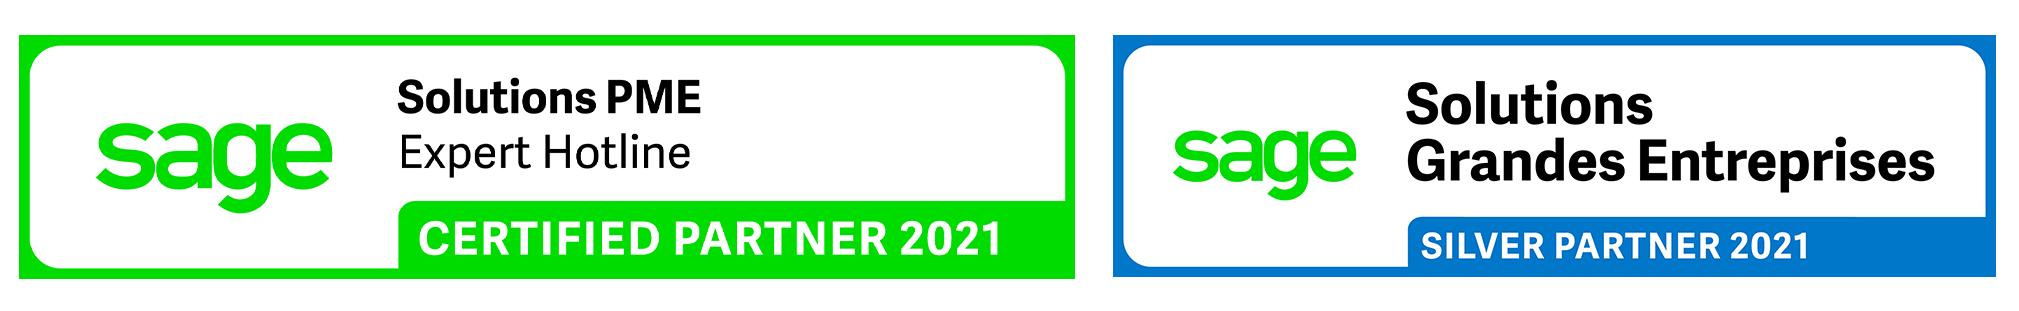 Mercuria Certification Sage PME et GME 2021